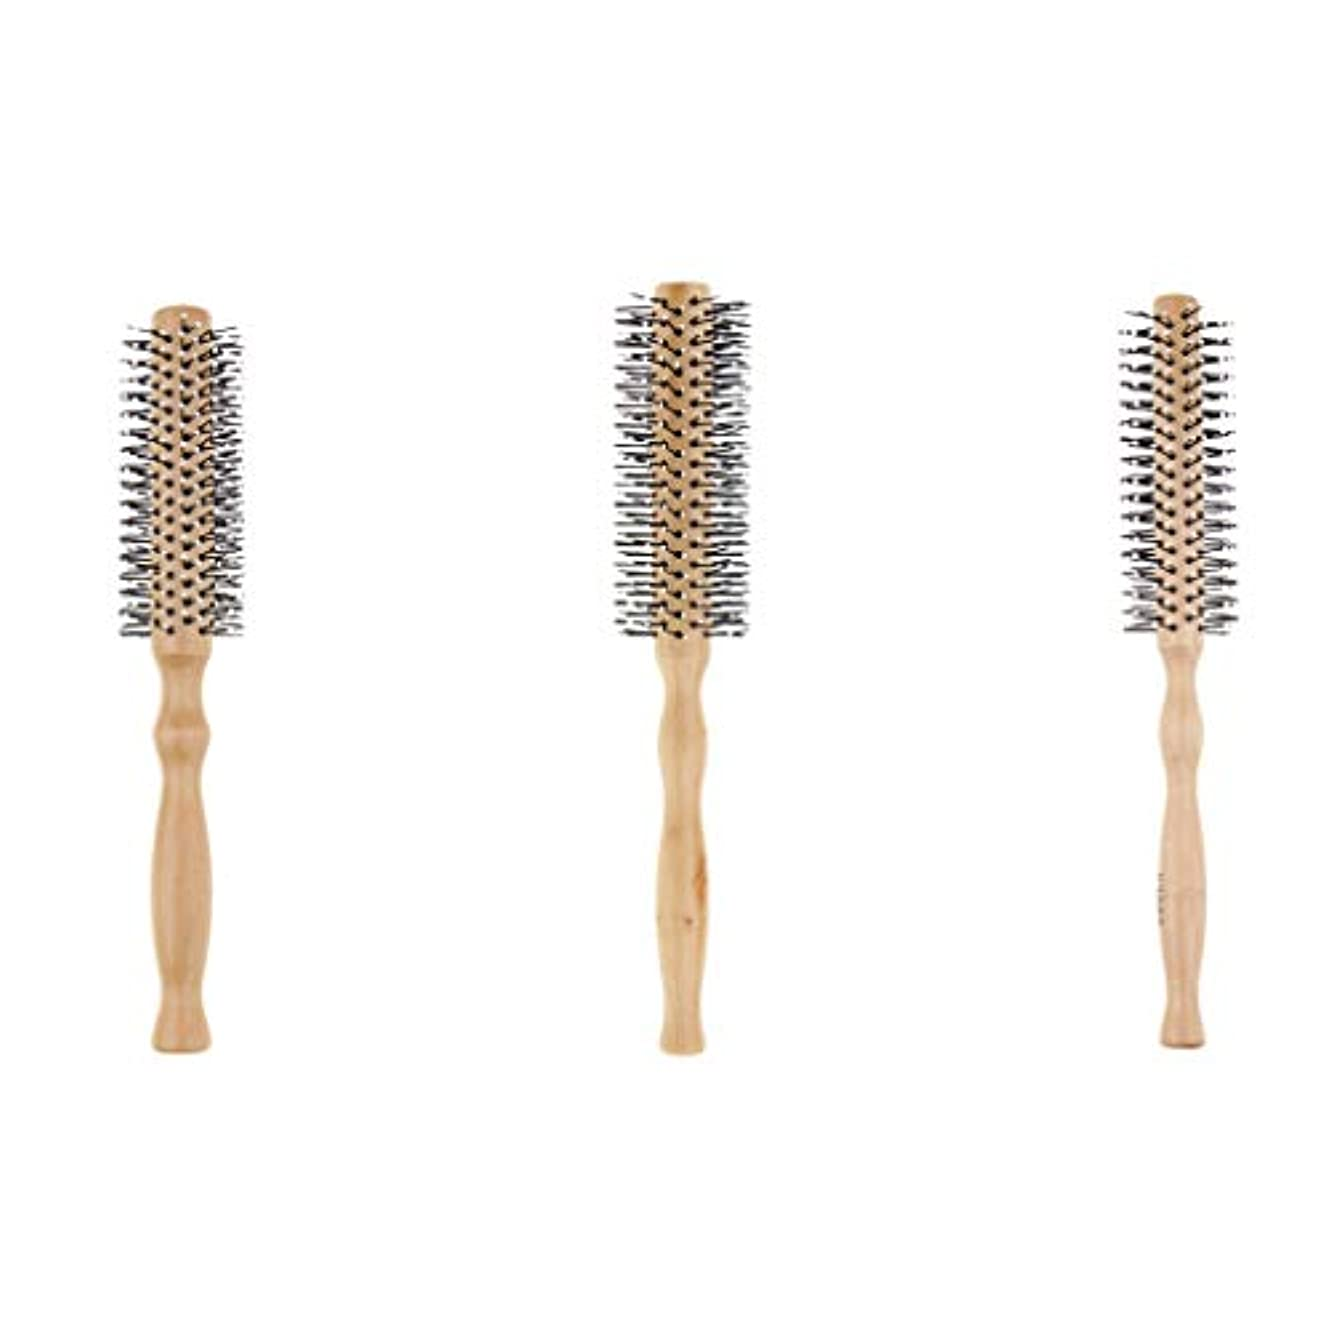 SM SunniMix 3本セット ロールブラシ 巻き髪 ヘアブラシ 木製櫛 スタイリングブラシ